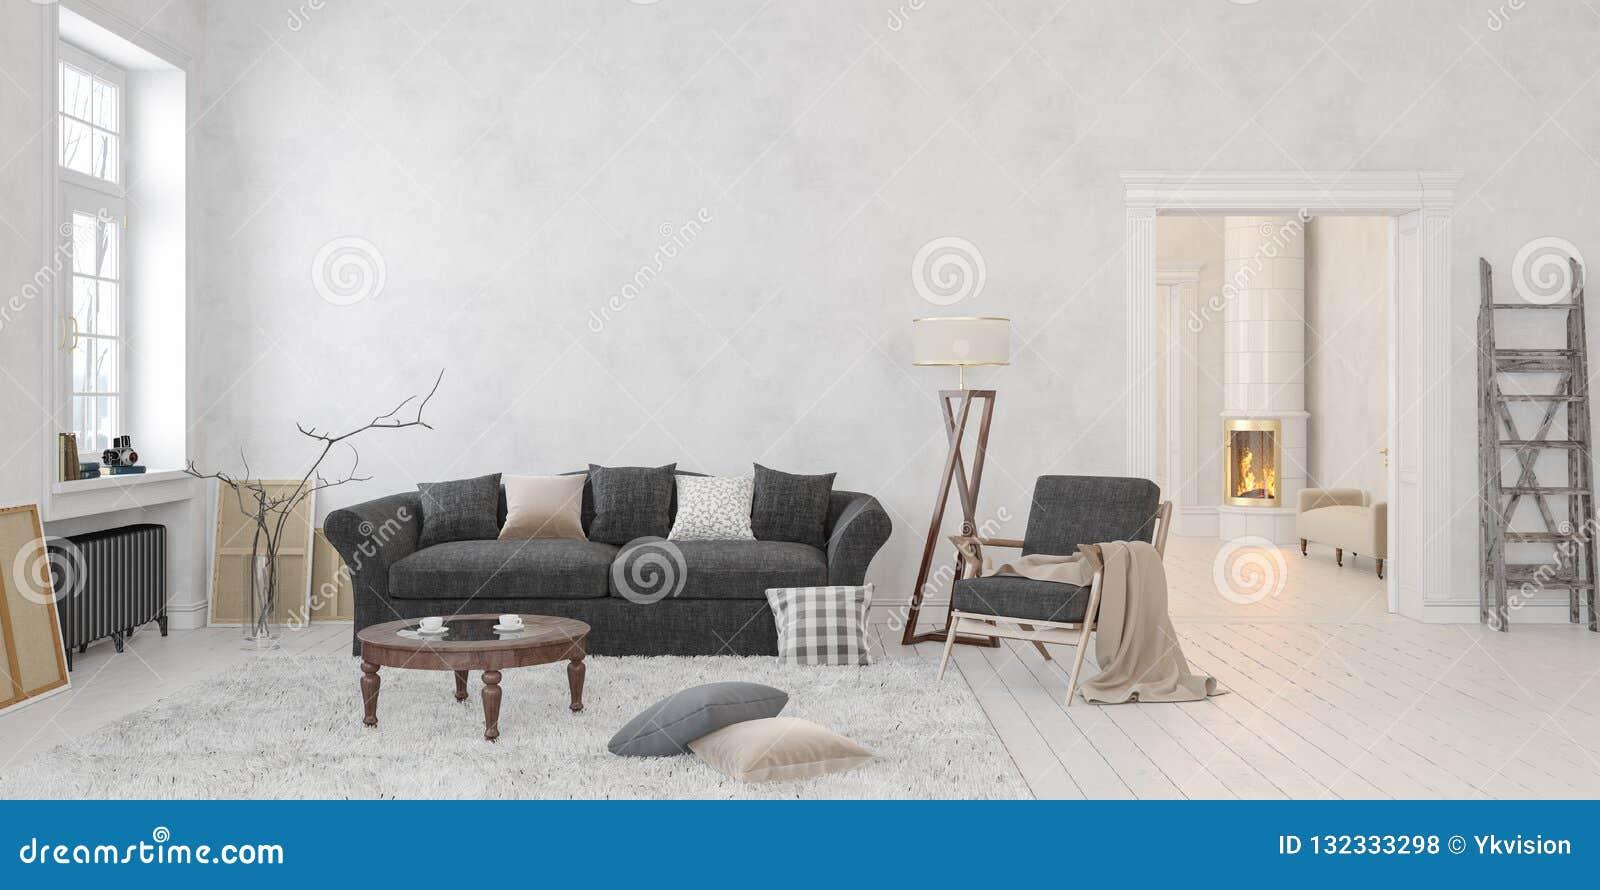 Stupendous Classic Scandinavian White Interior With Fireplace Sofa Theyellowbook Wood Chair Design Ideas Theyellowbookinfo